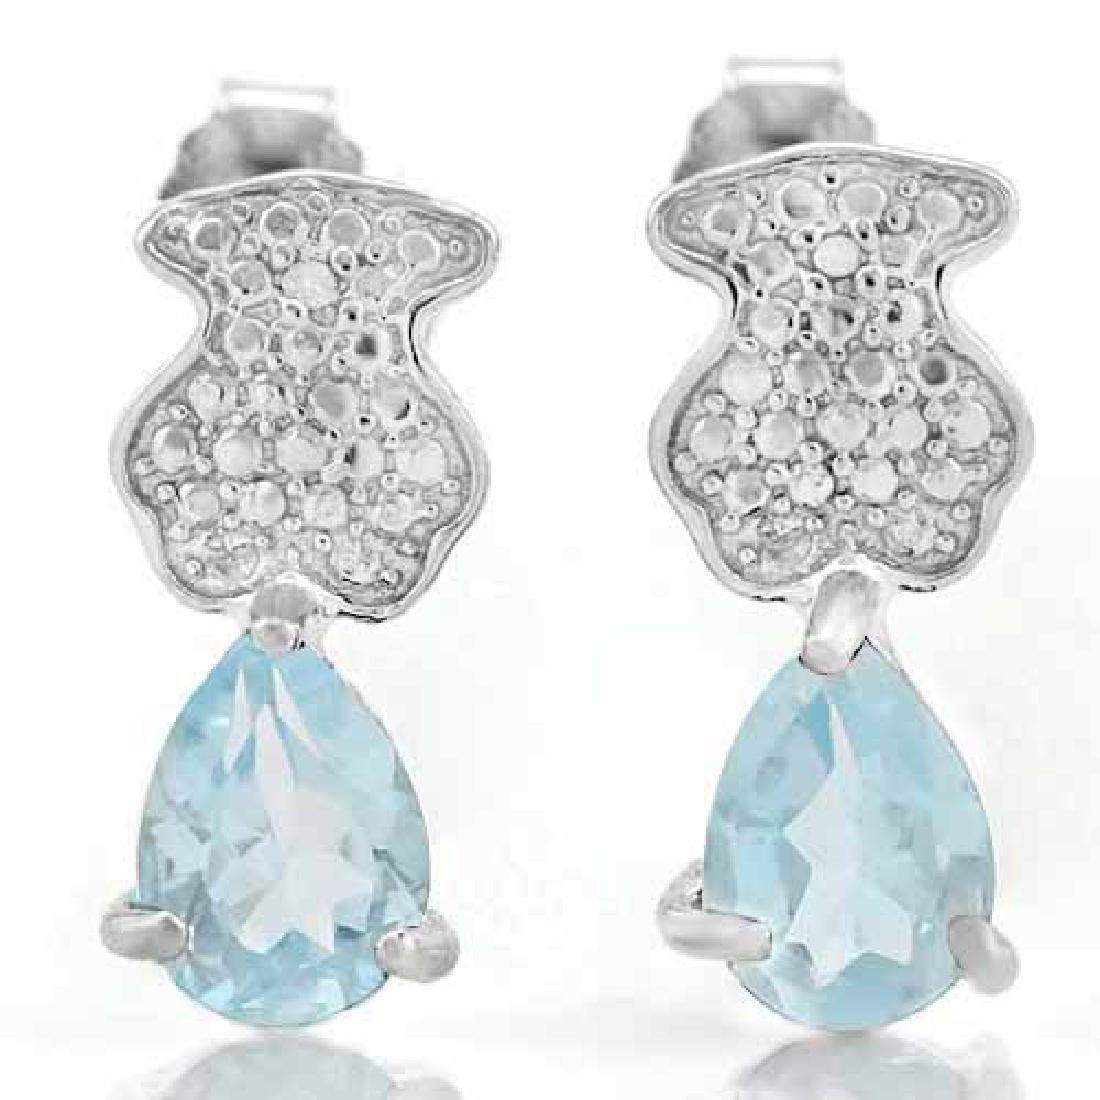 4/5 CARAT BABY SWISS BLUE TOPAZ & DIAMOND 925 STERLING